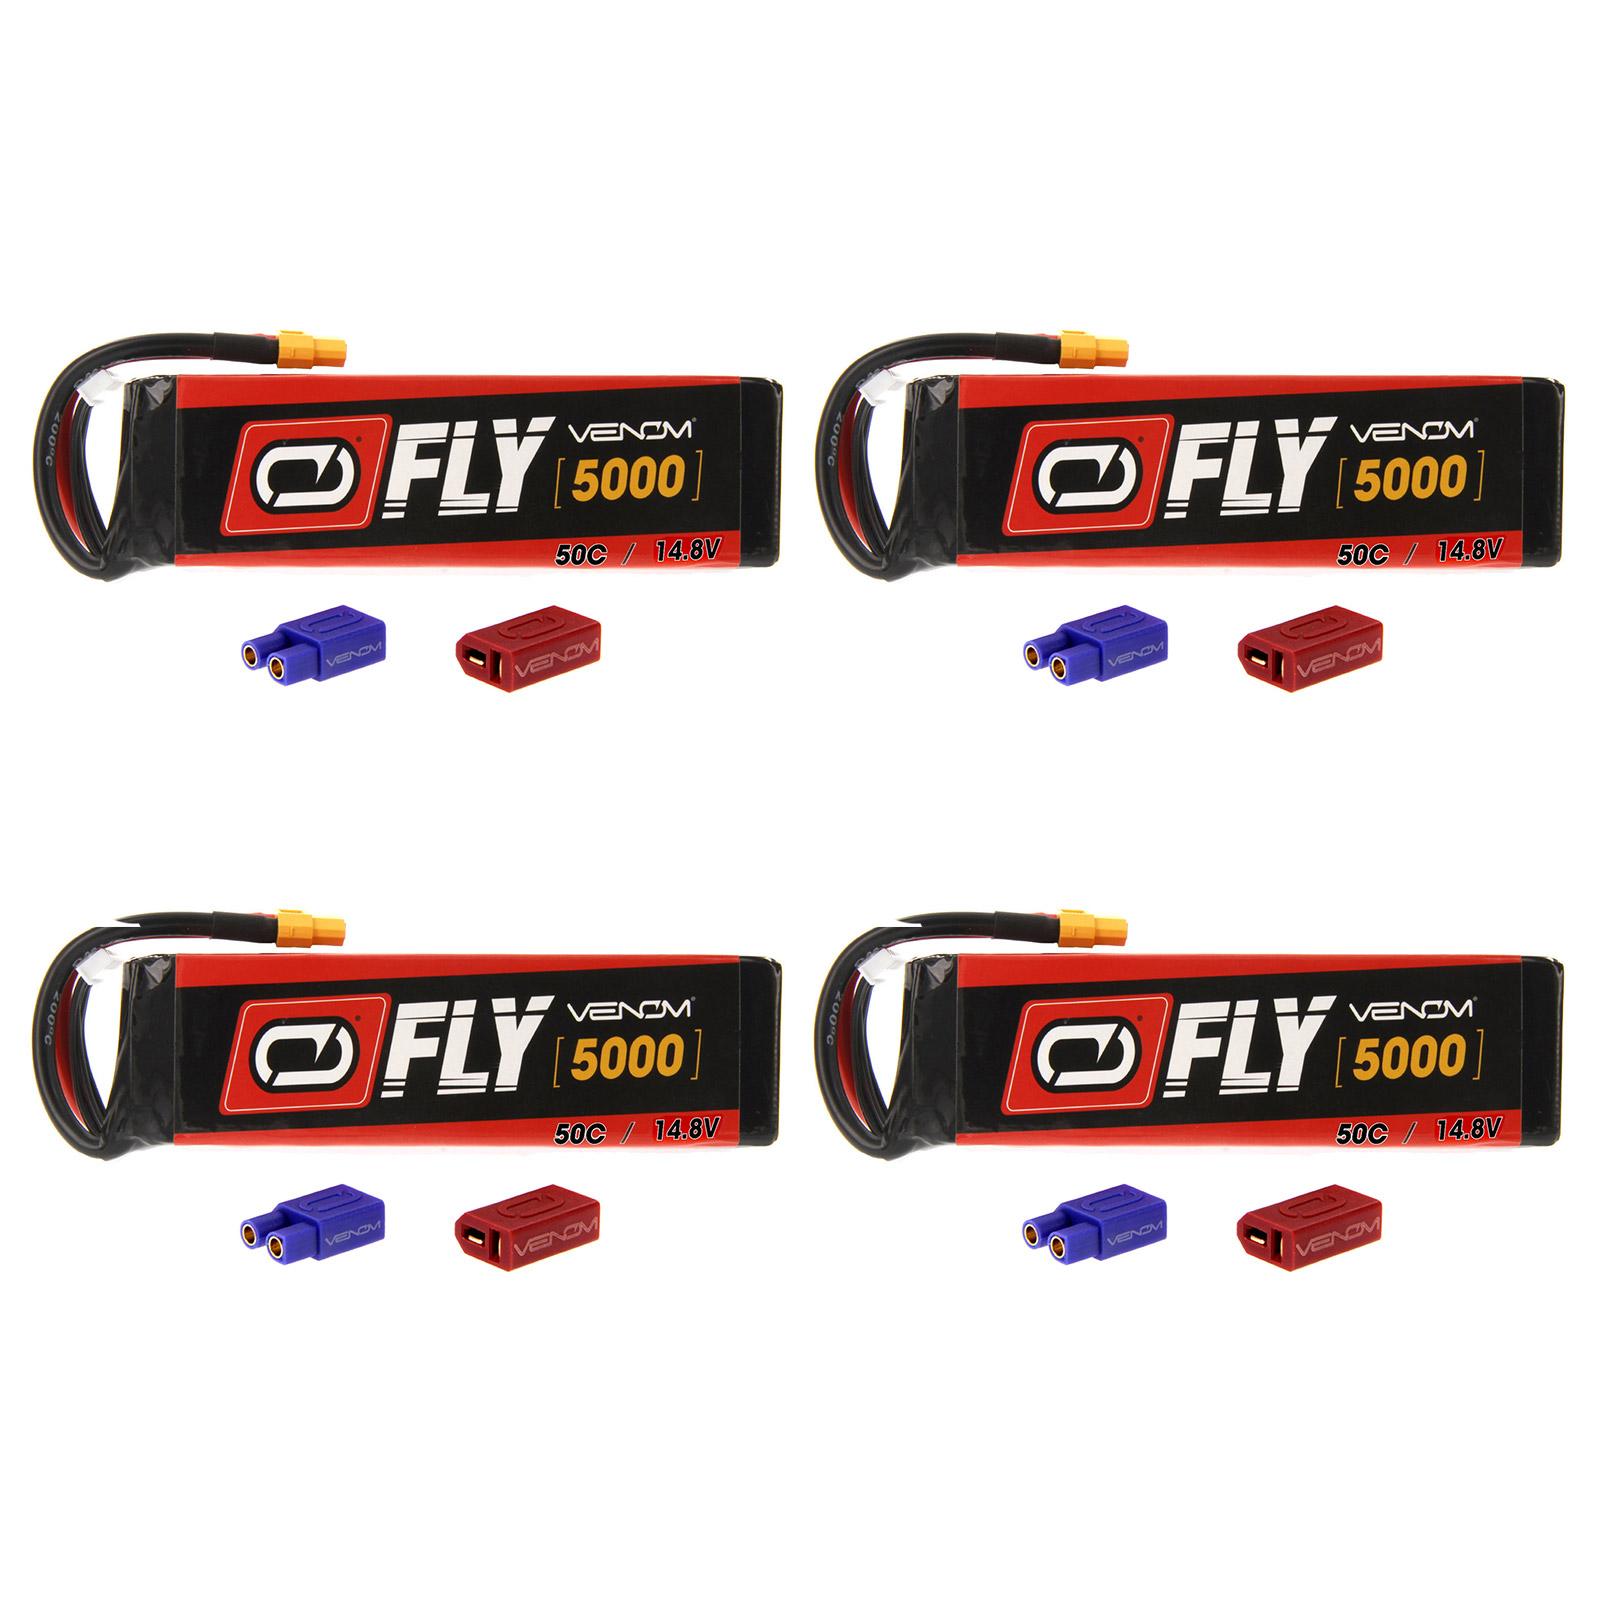 Venom Fly 50C 4S 5000mAh 14.8V LiPo Battery with  UNI 2.0 Plug (XT60/Deans/EC3) x4 Packs Compare to E-flite EFLB50004S30